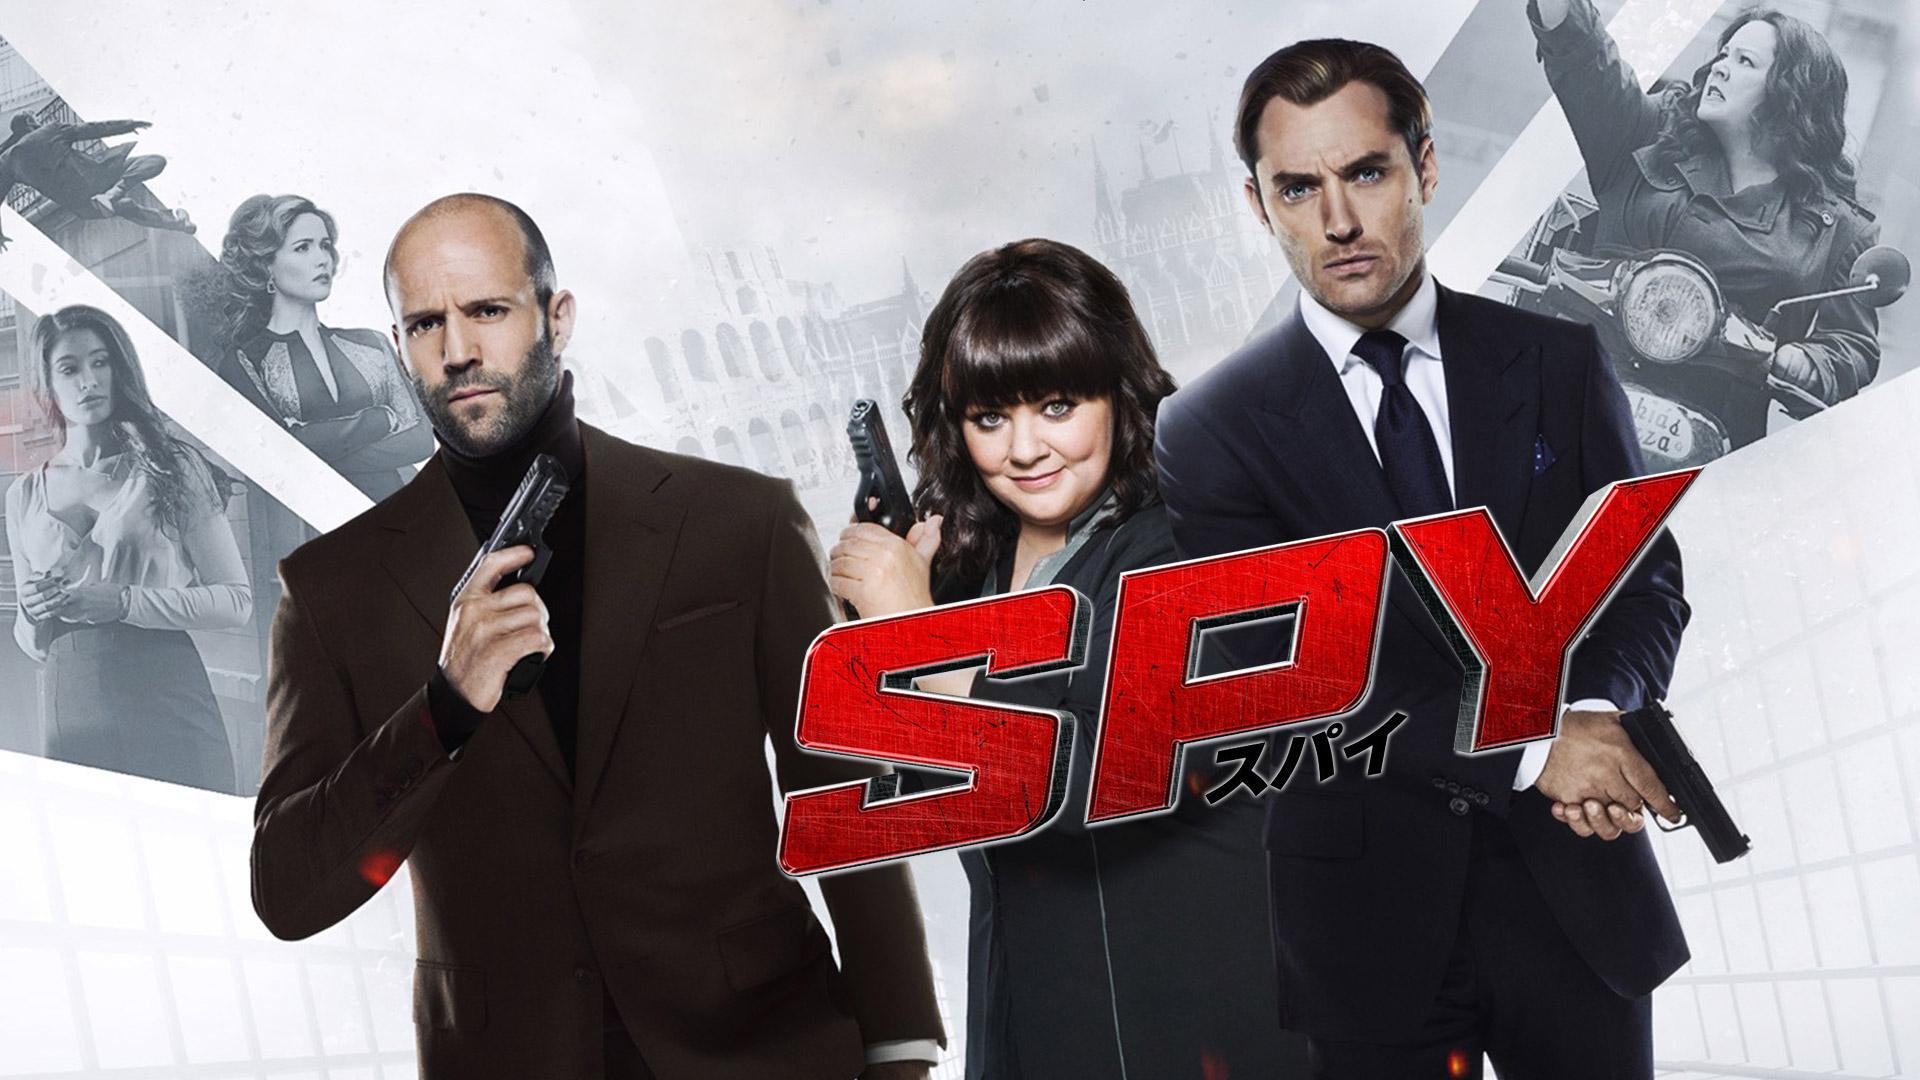 SPY/スパイ (吹替版)